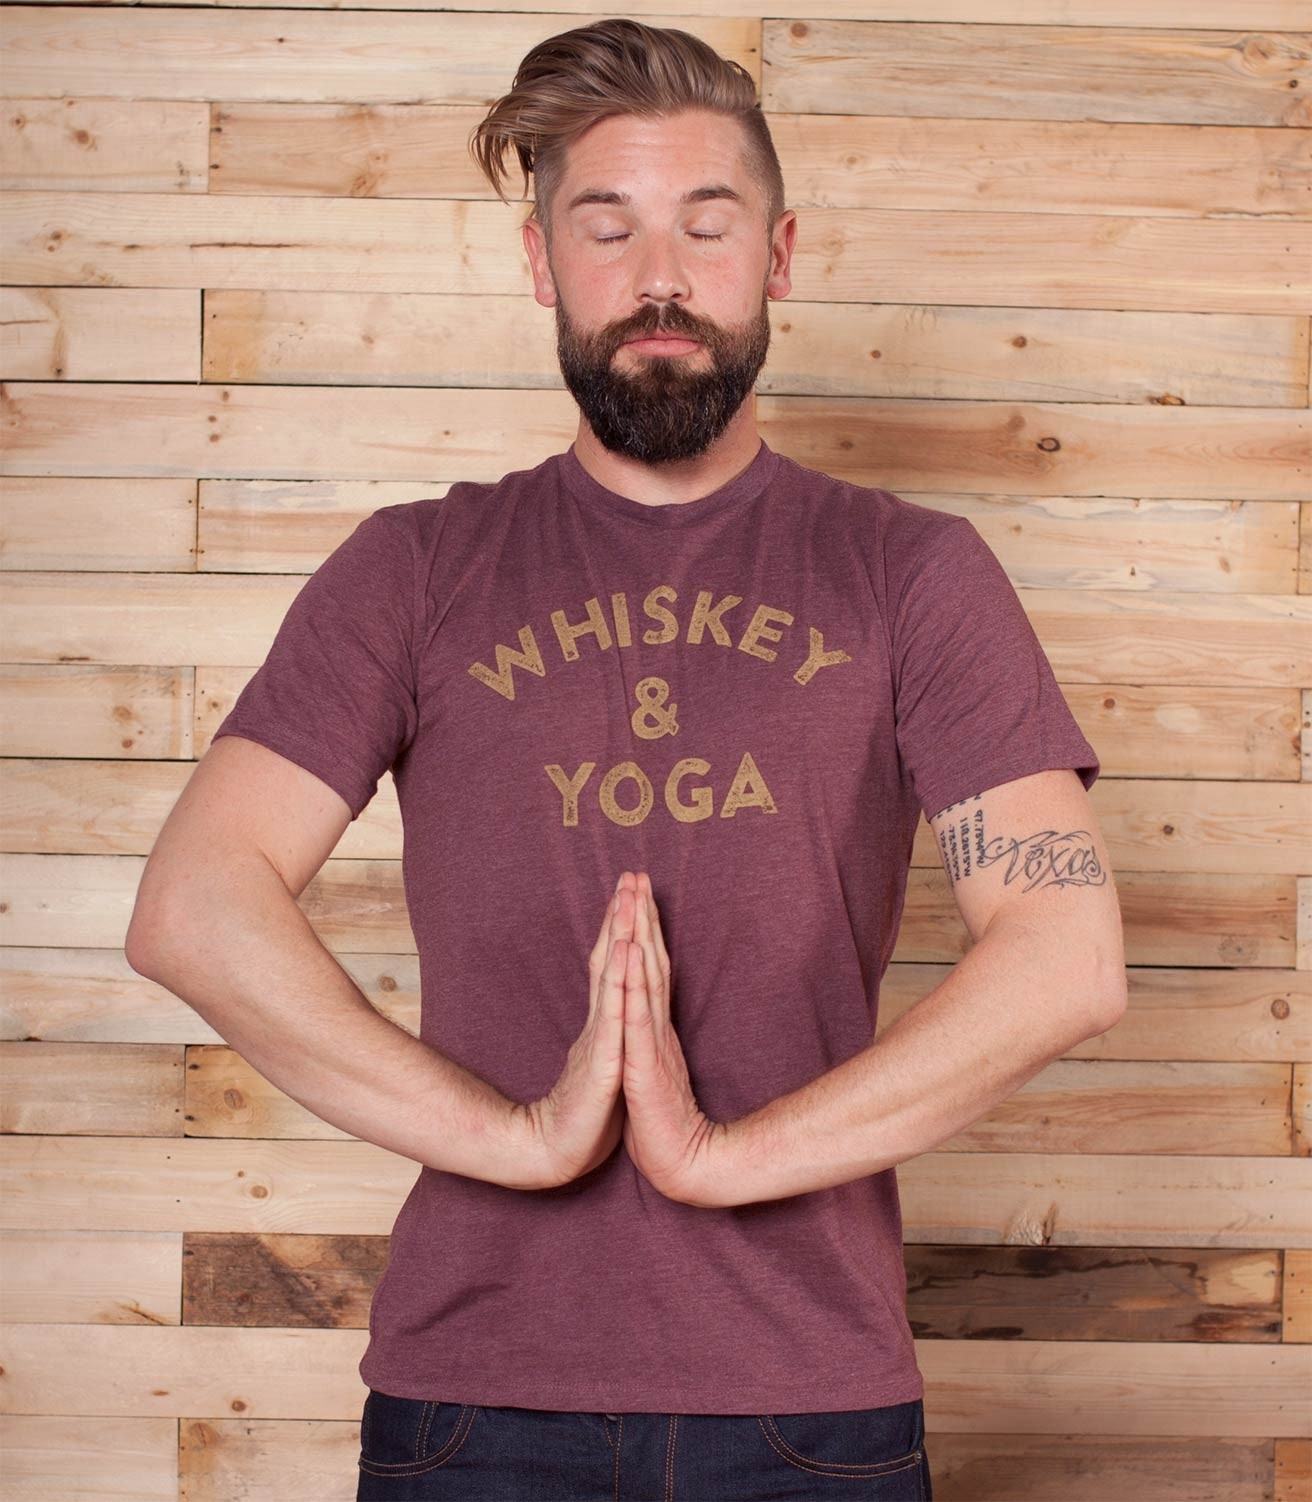 8bc12d908 Whiskey & Yoga Men's Funny Drinking T-Shirt | Headline Shirts